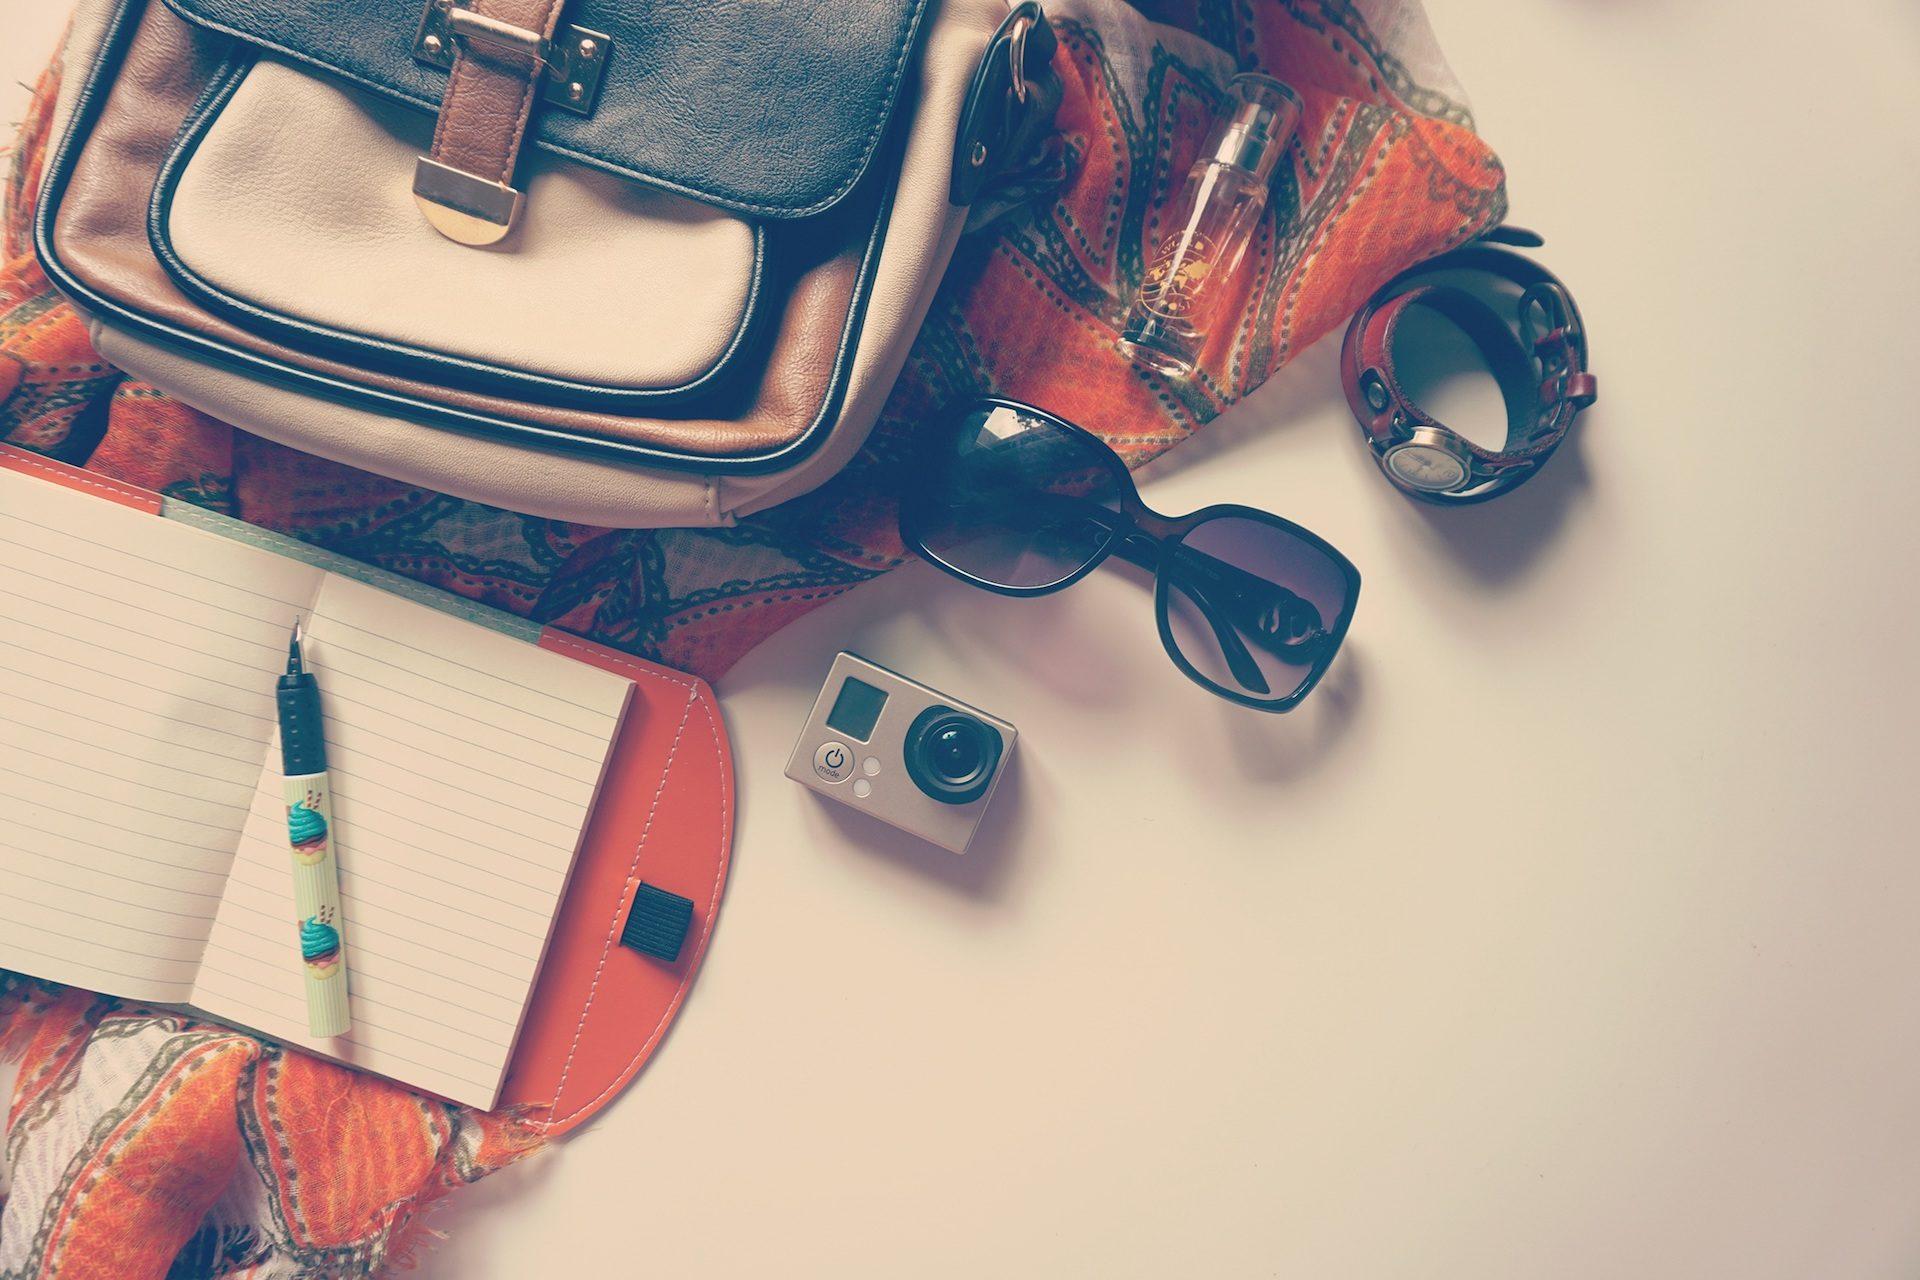 bolso, gafas, reloj, cámara, cuaderno, pluma, pañuelo - Fondos de Pantalla HD - professor-falken.com